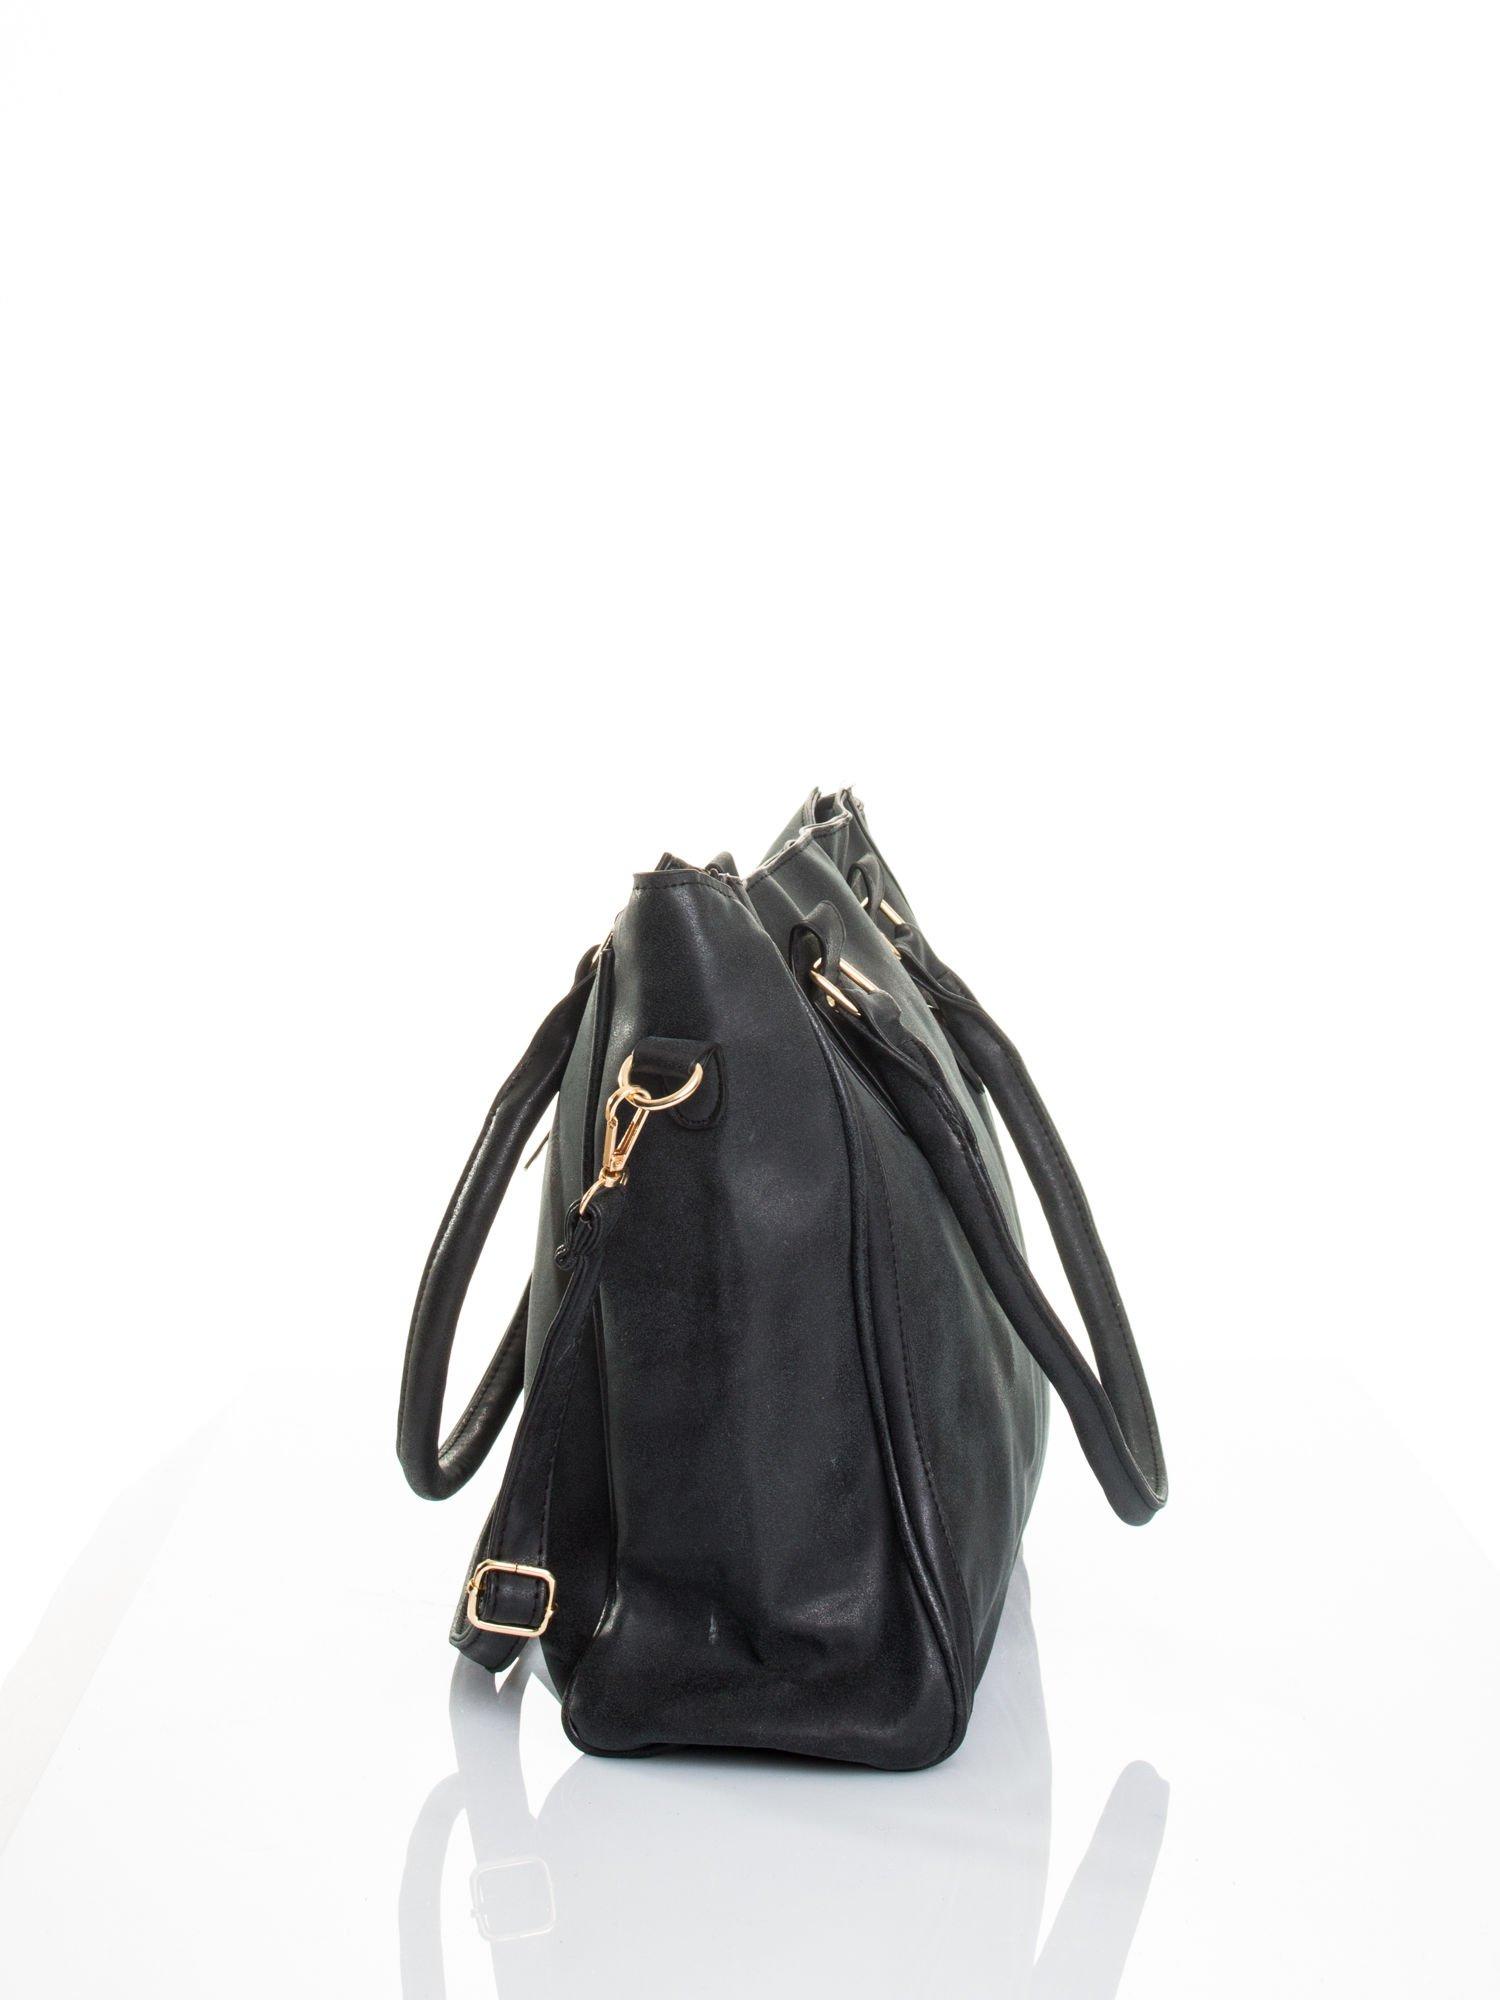 Czarna torebka miejska                                  zdj.                                  5